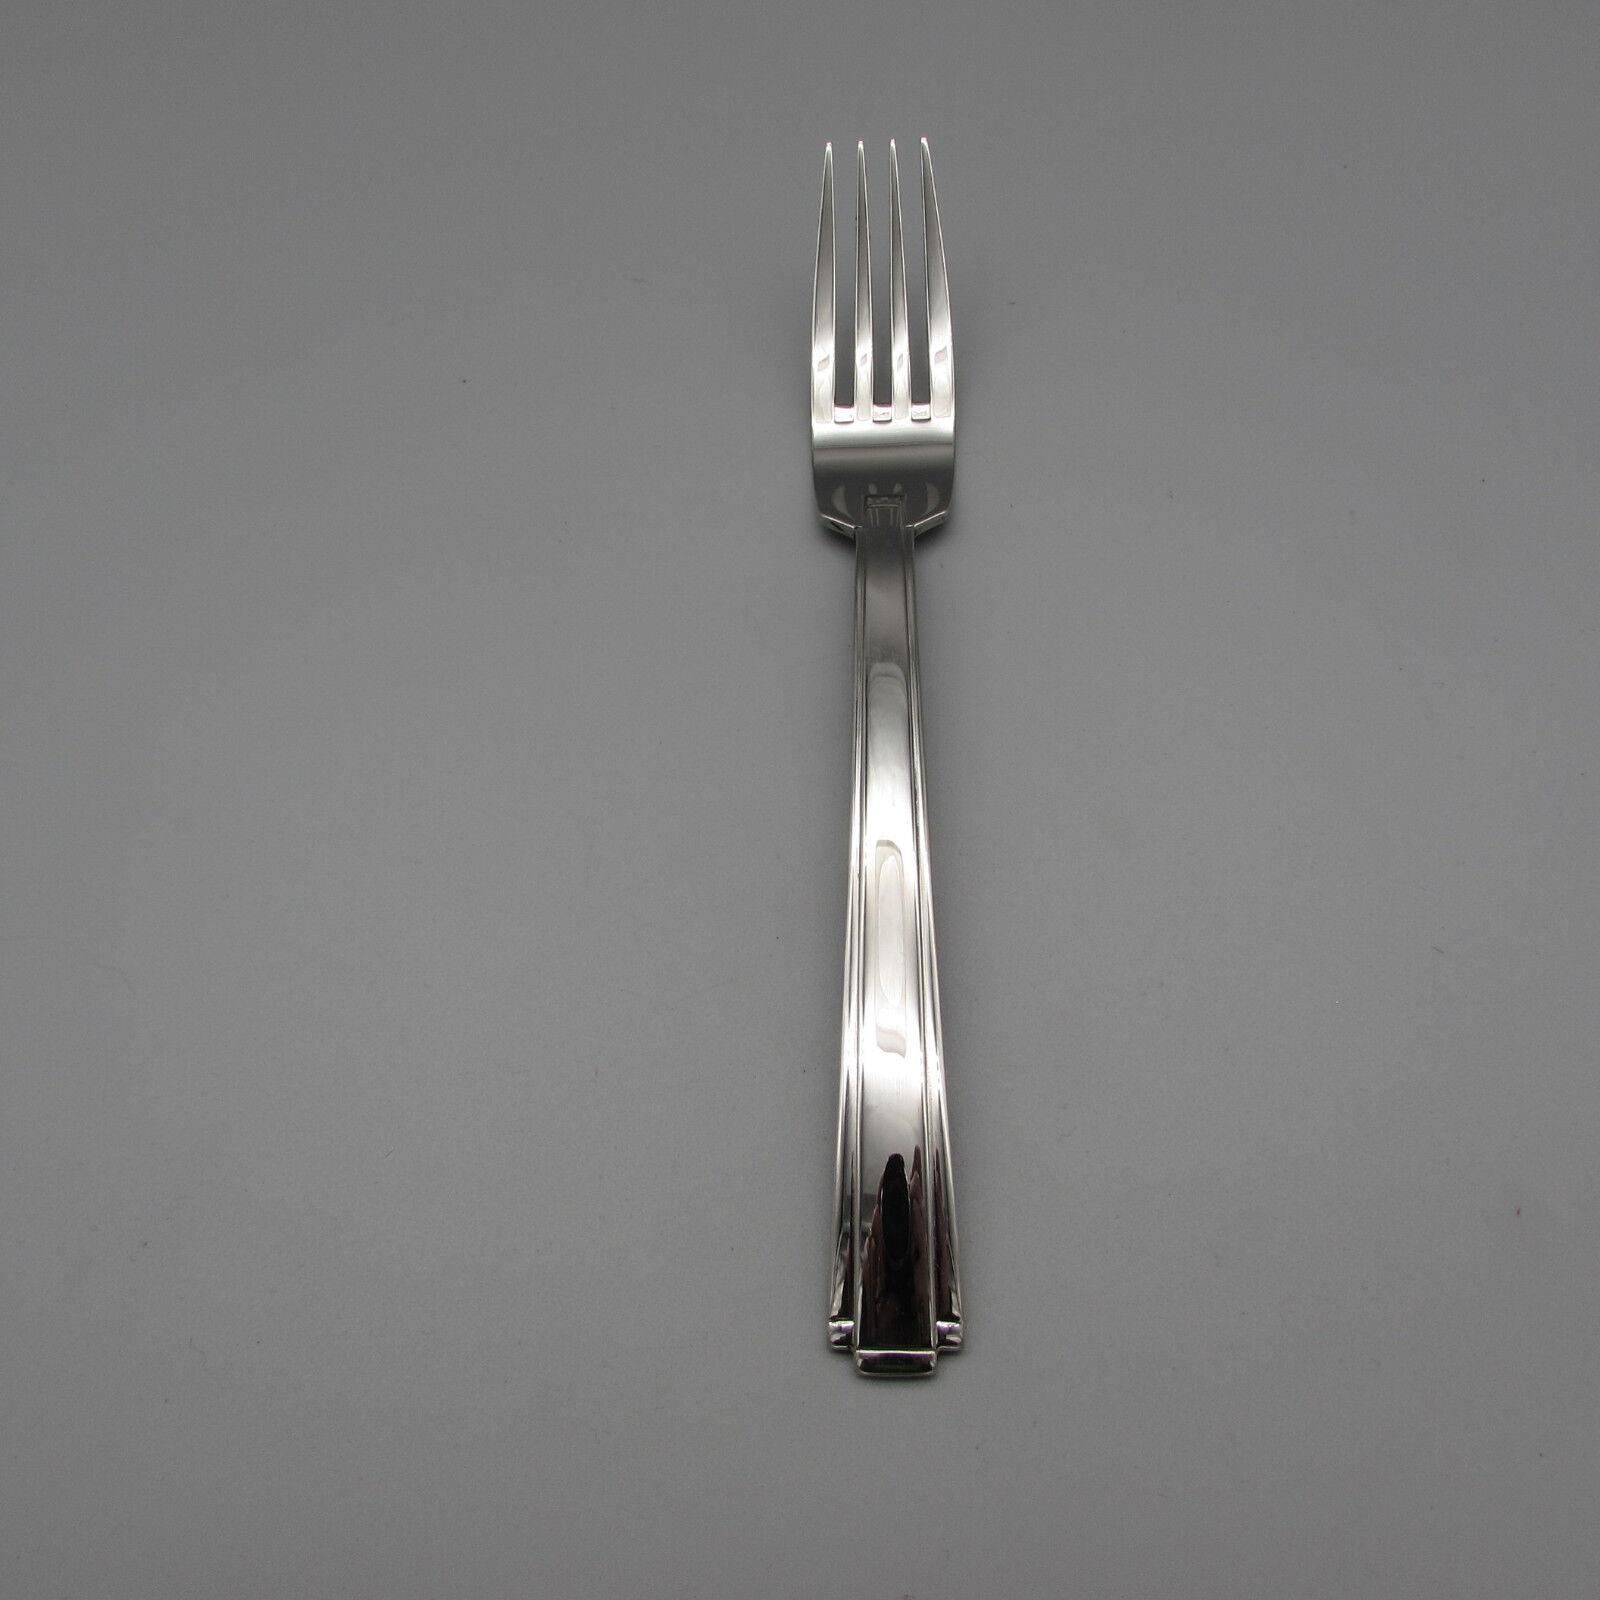 Oneida Stainless GRAND MAJESTY Dinner Fork HEIRLOOM USA